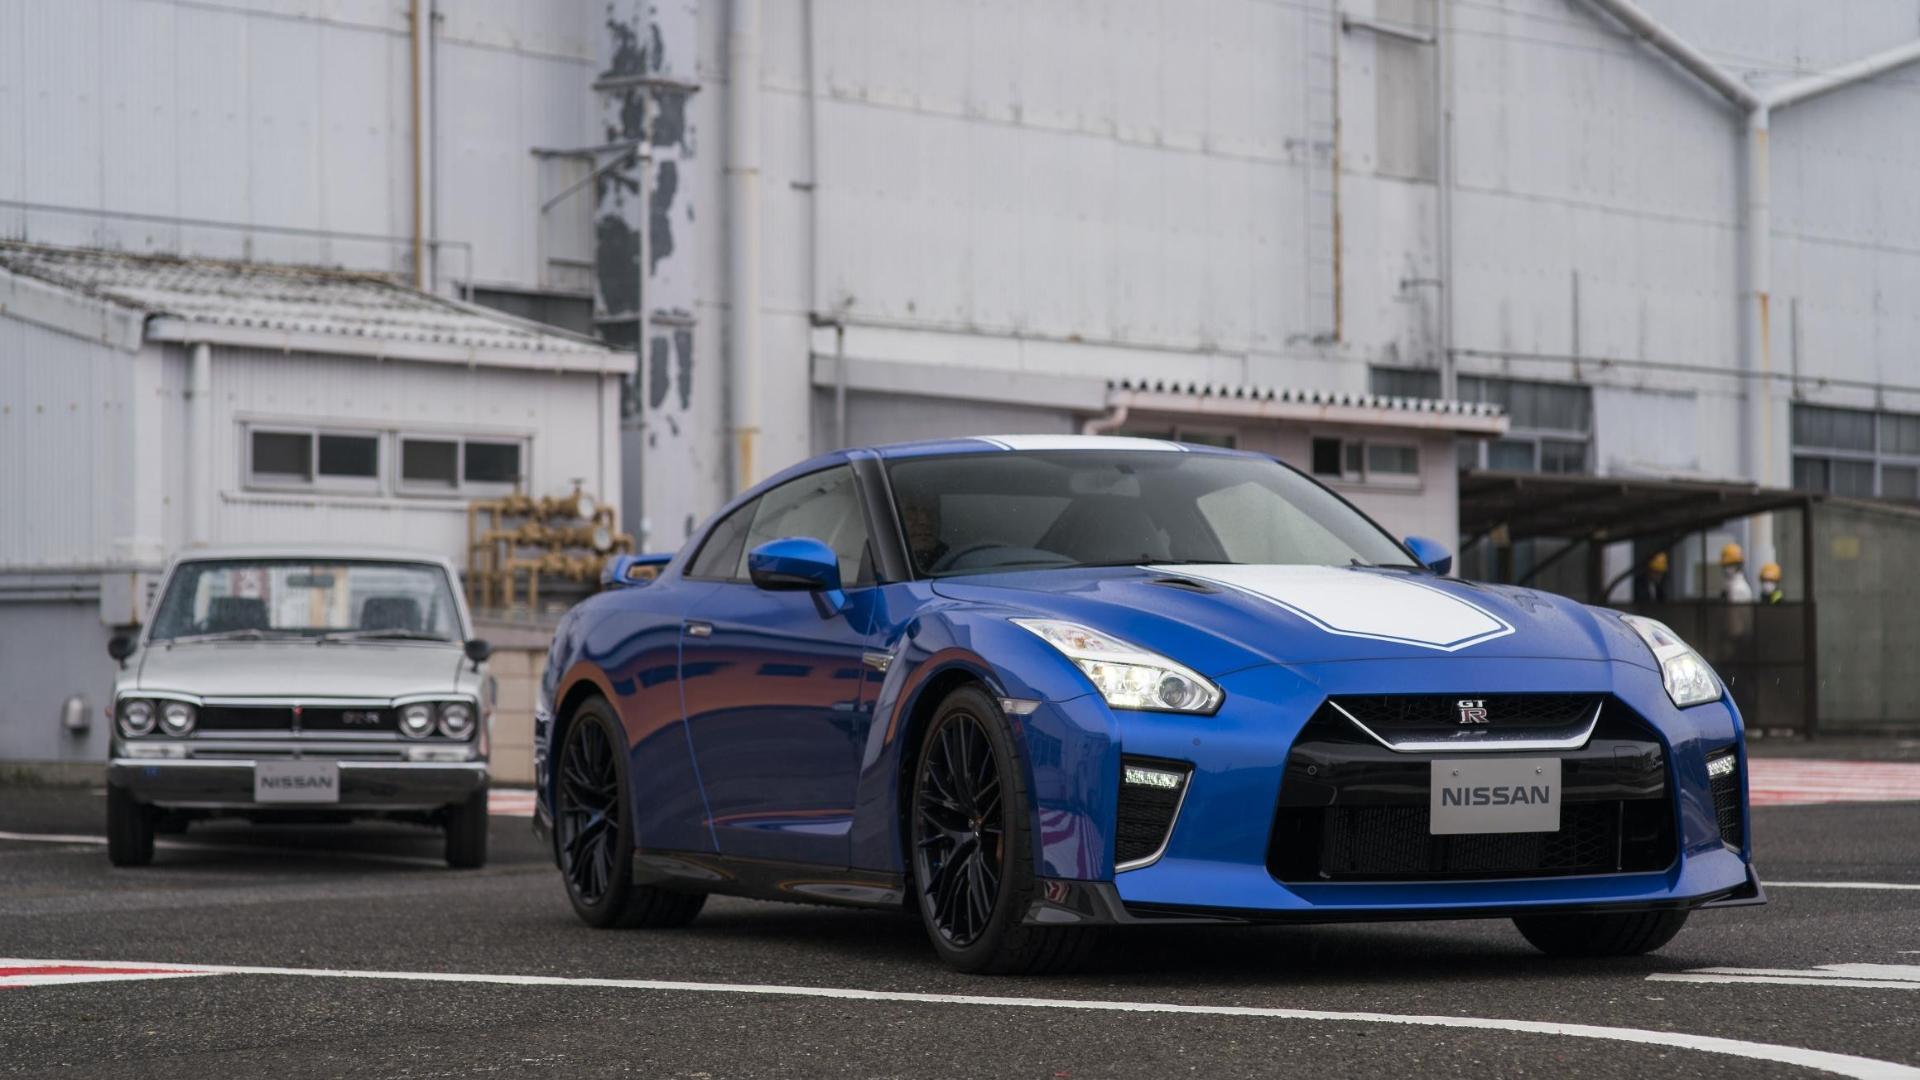 Nissan sports cars